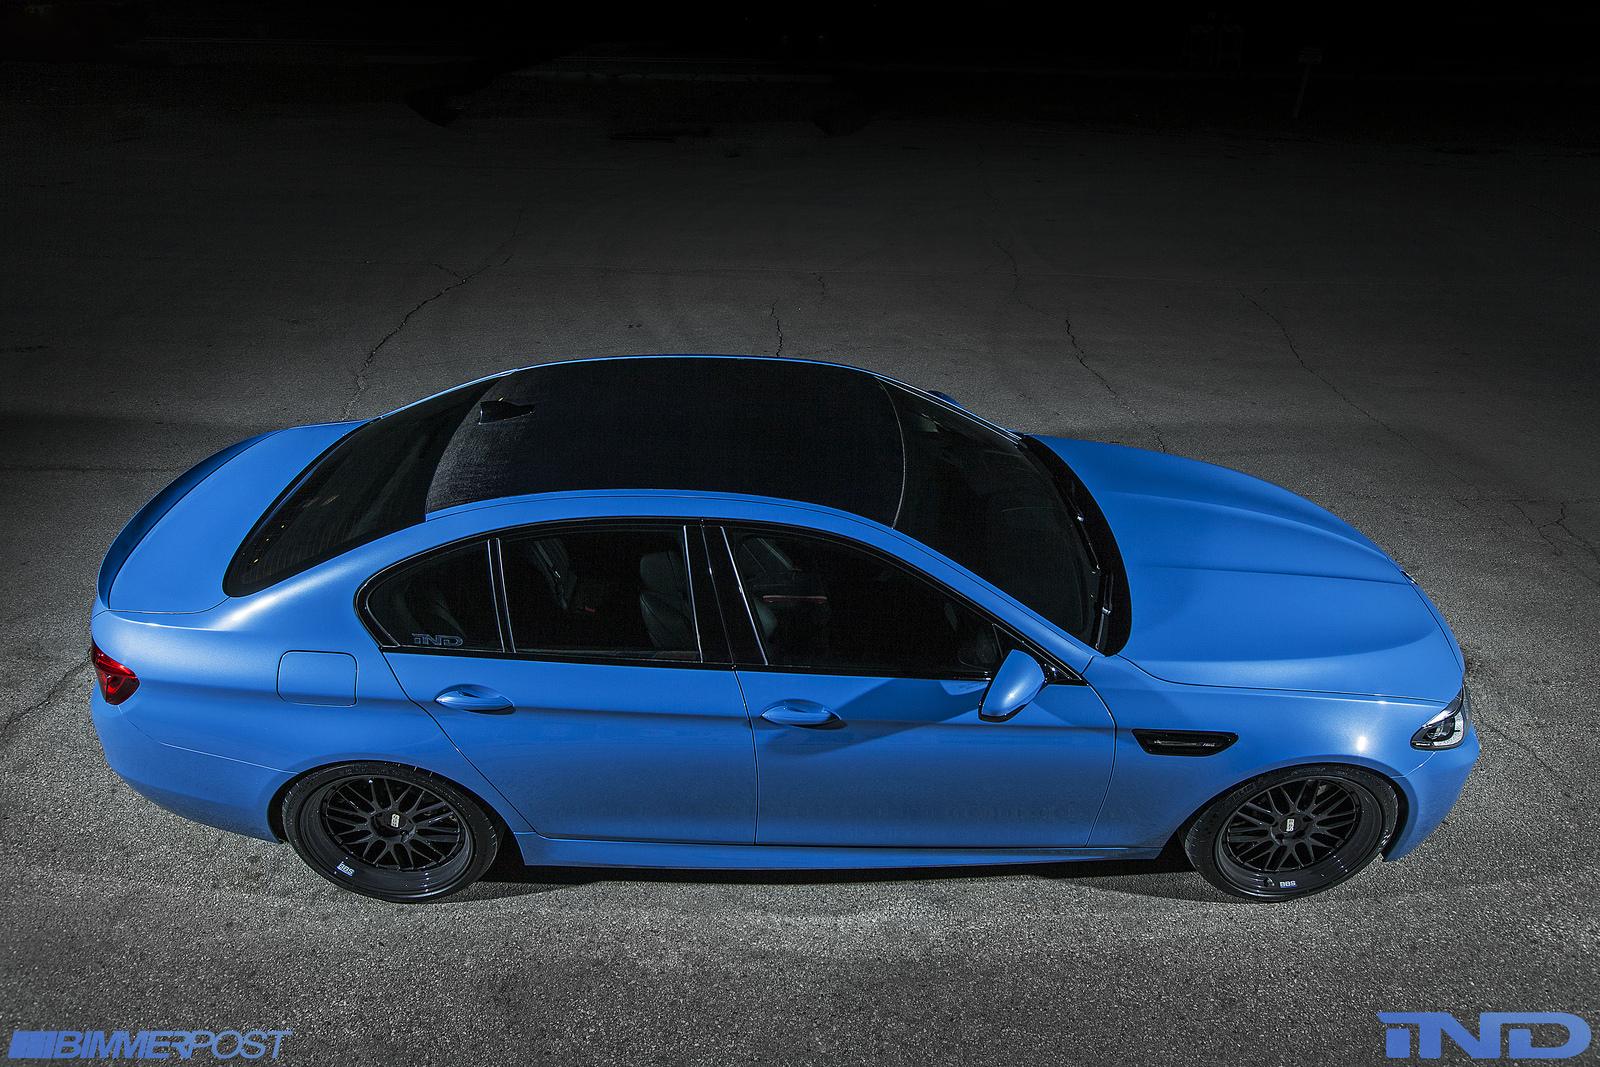 Bmw M5 F10 >> iND's BMW F10 M5 is a Yas Marina Blue Wonder - autoevolution